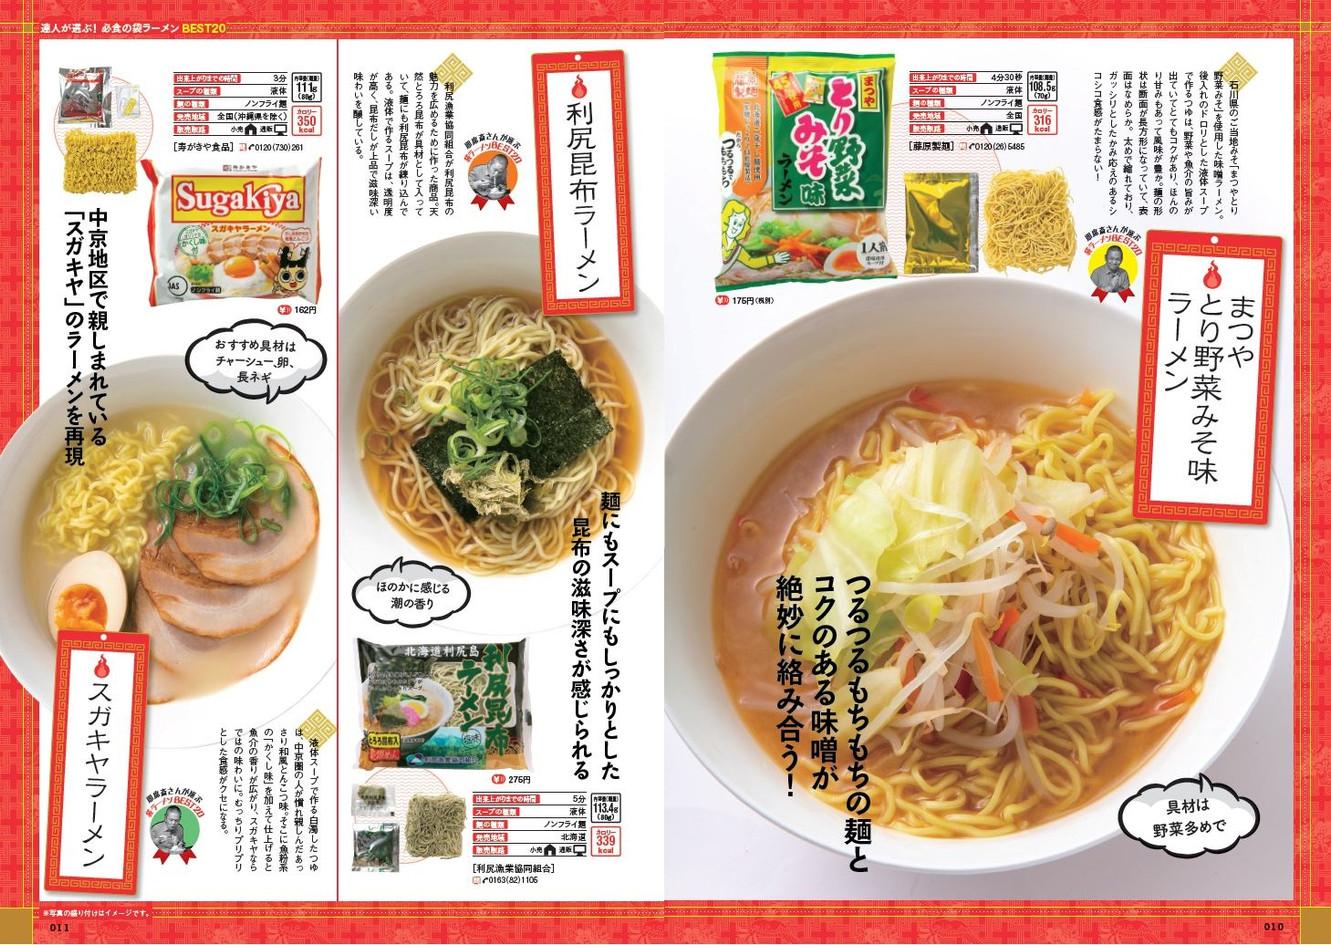 2.jpgおとなが愉しむ おうちラーメン&麺の世界